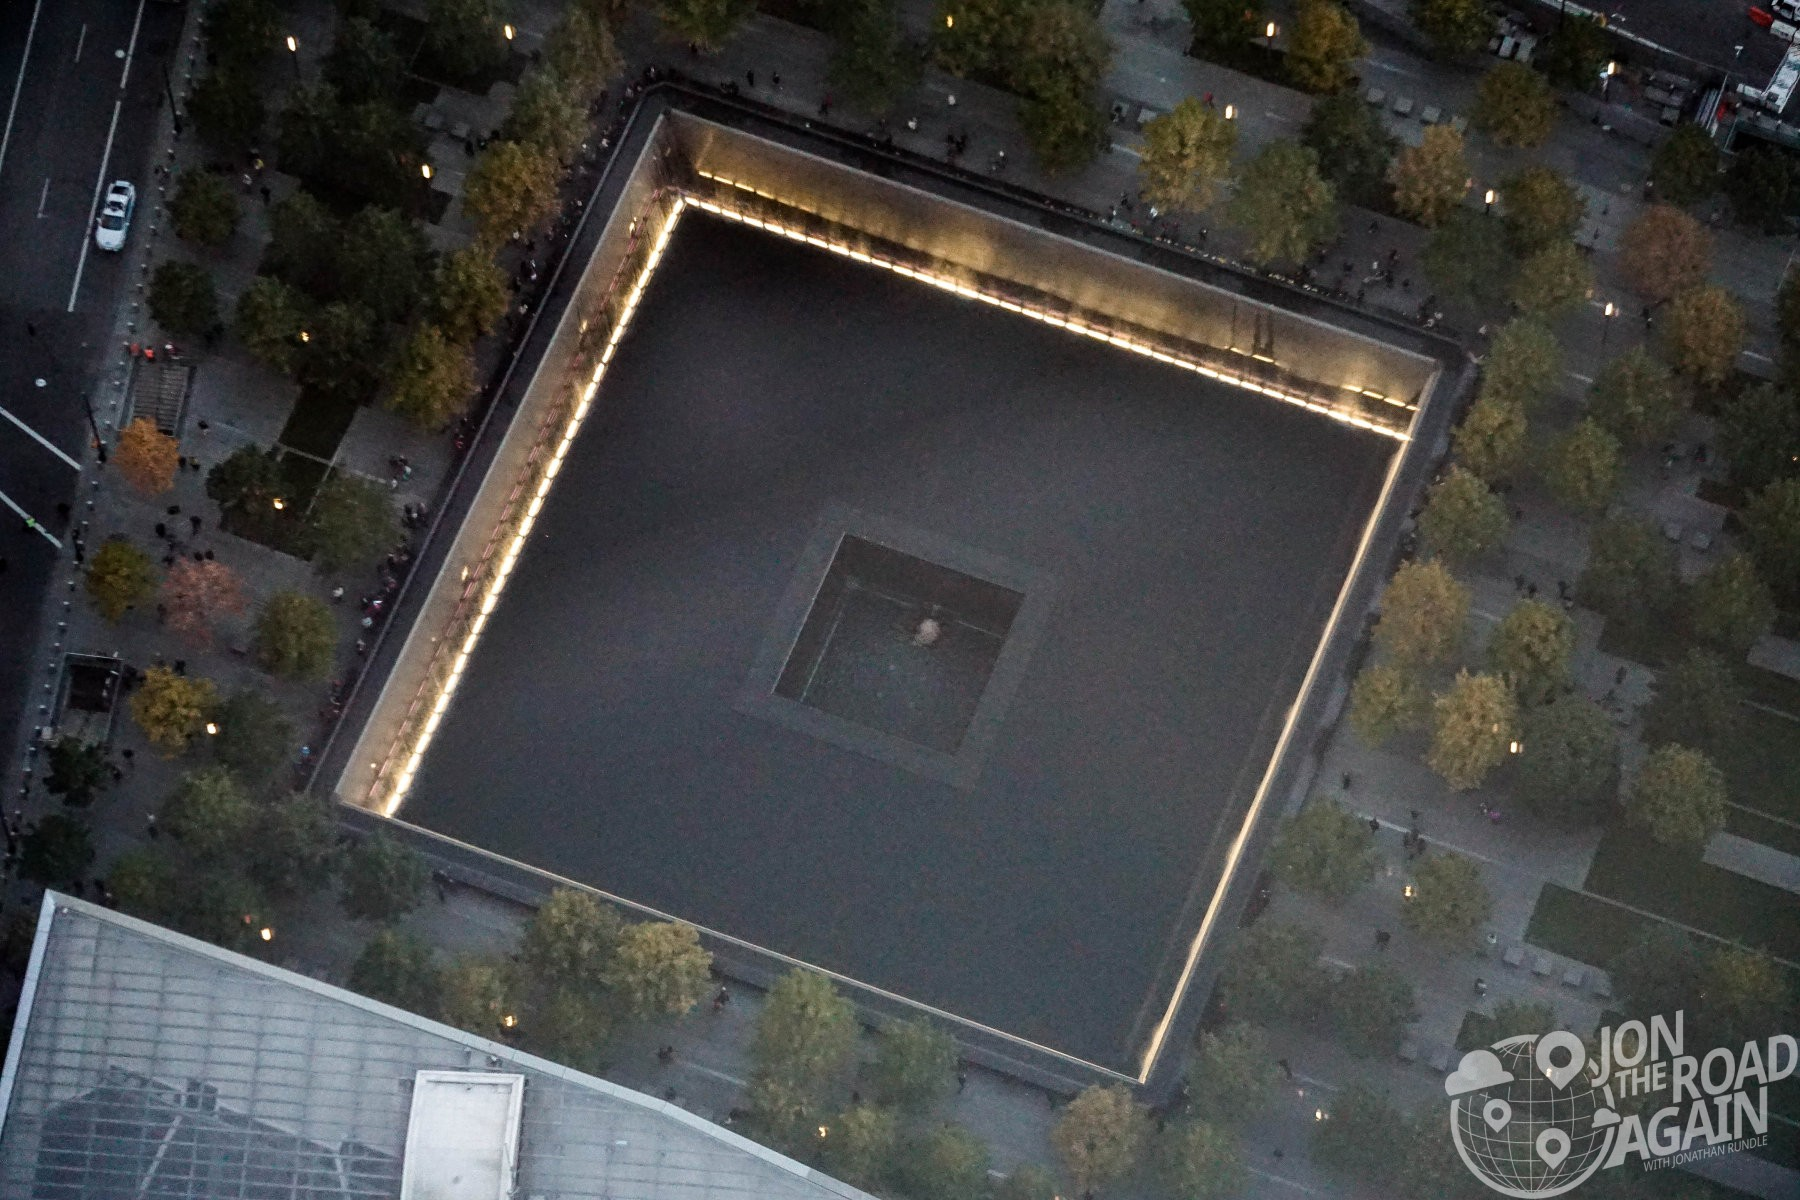 September 11th Memorial footprint